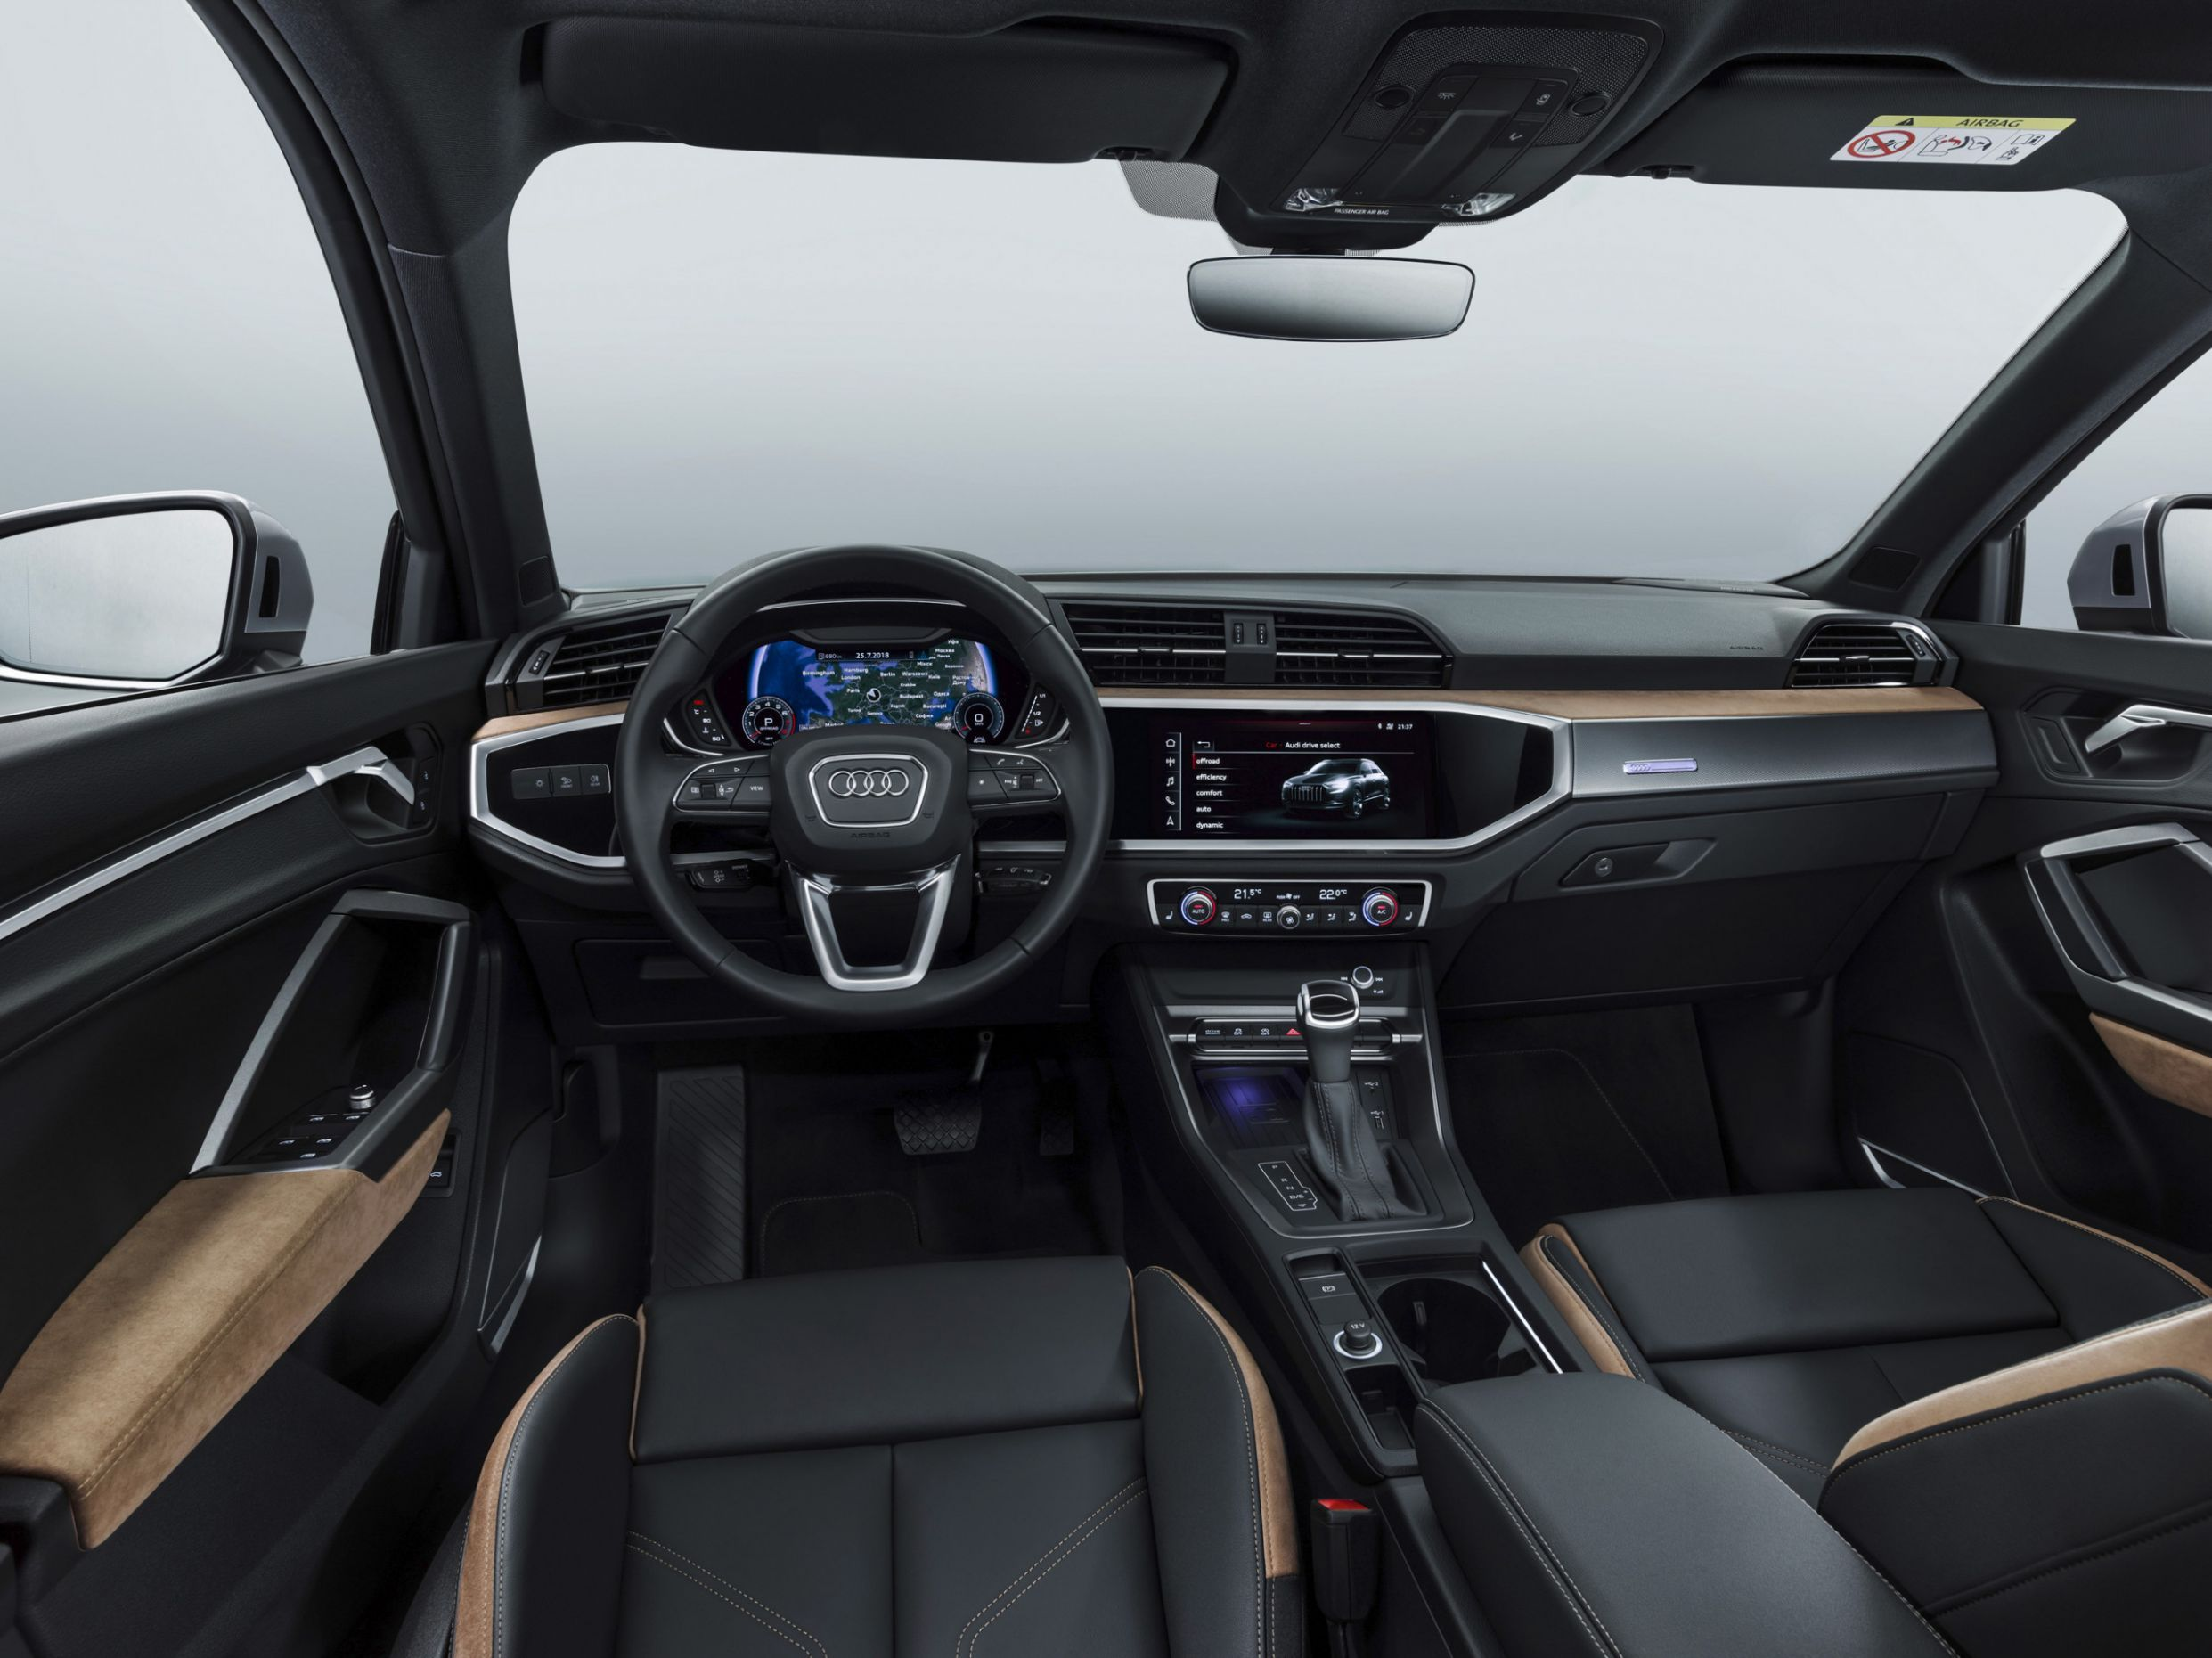 2021 Audi Q3 Usa Release Date Reviews Audi Q3 Audi Audi Rs3